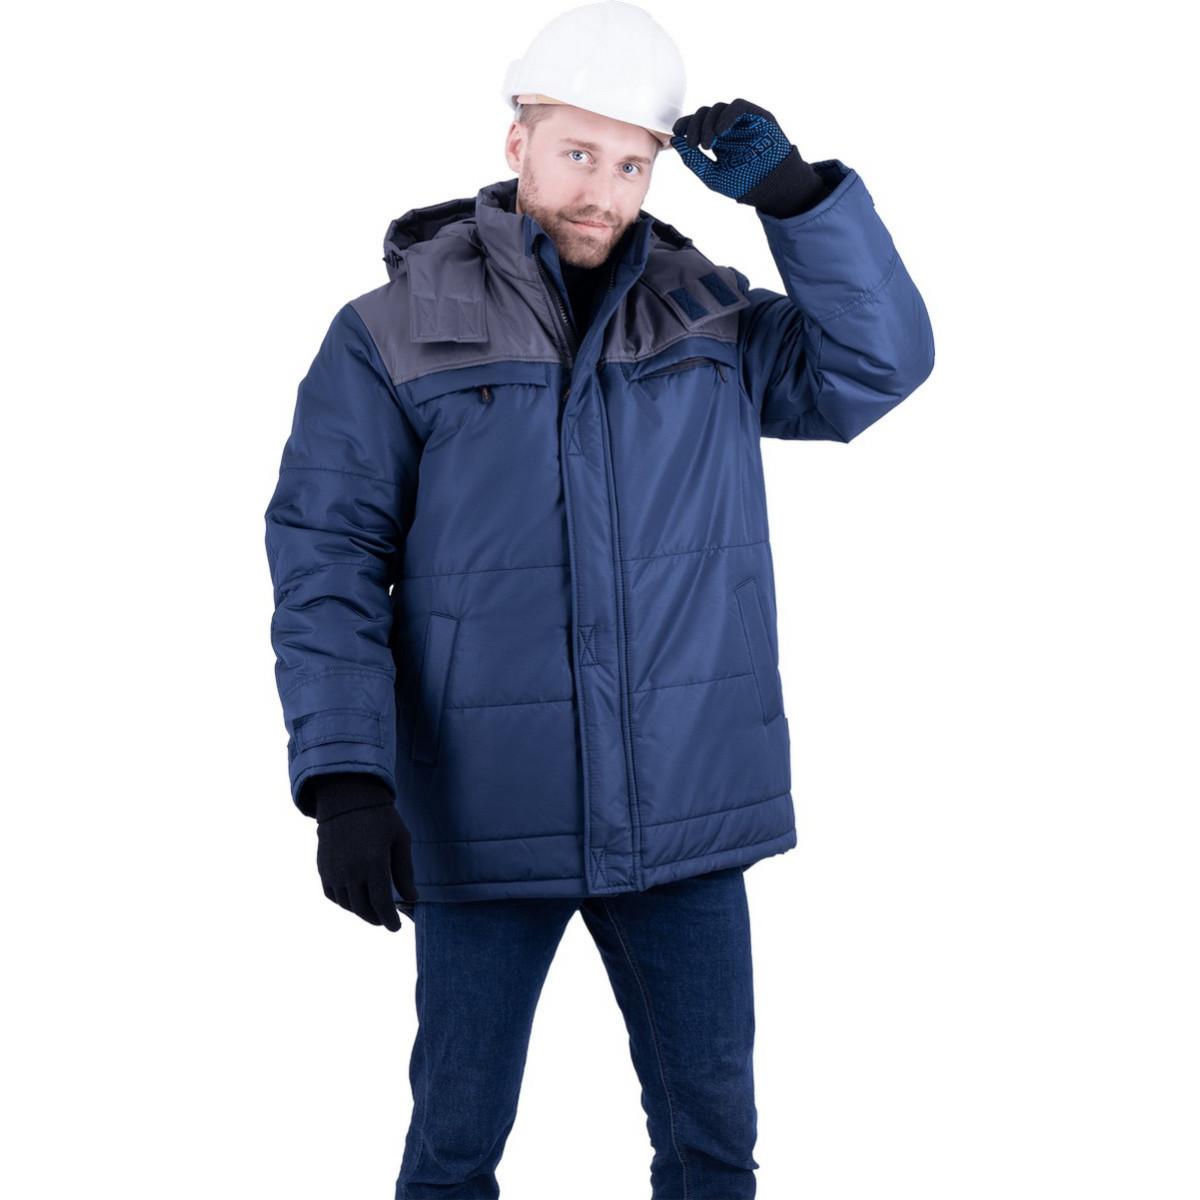 Куртка ШАТЛ утепленная  т/синий-серый (разм. 128-132 рост 182-188)